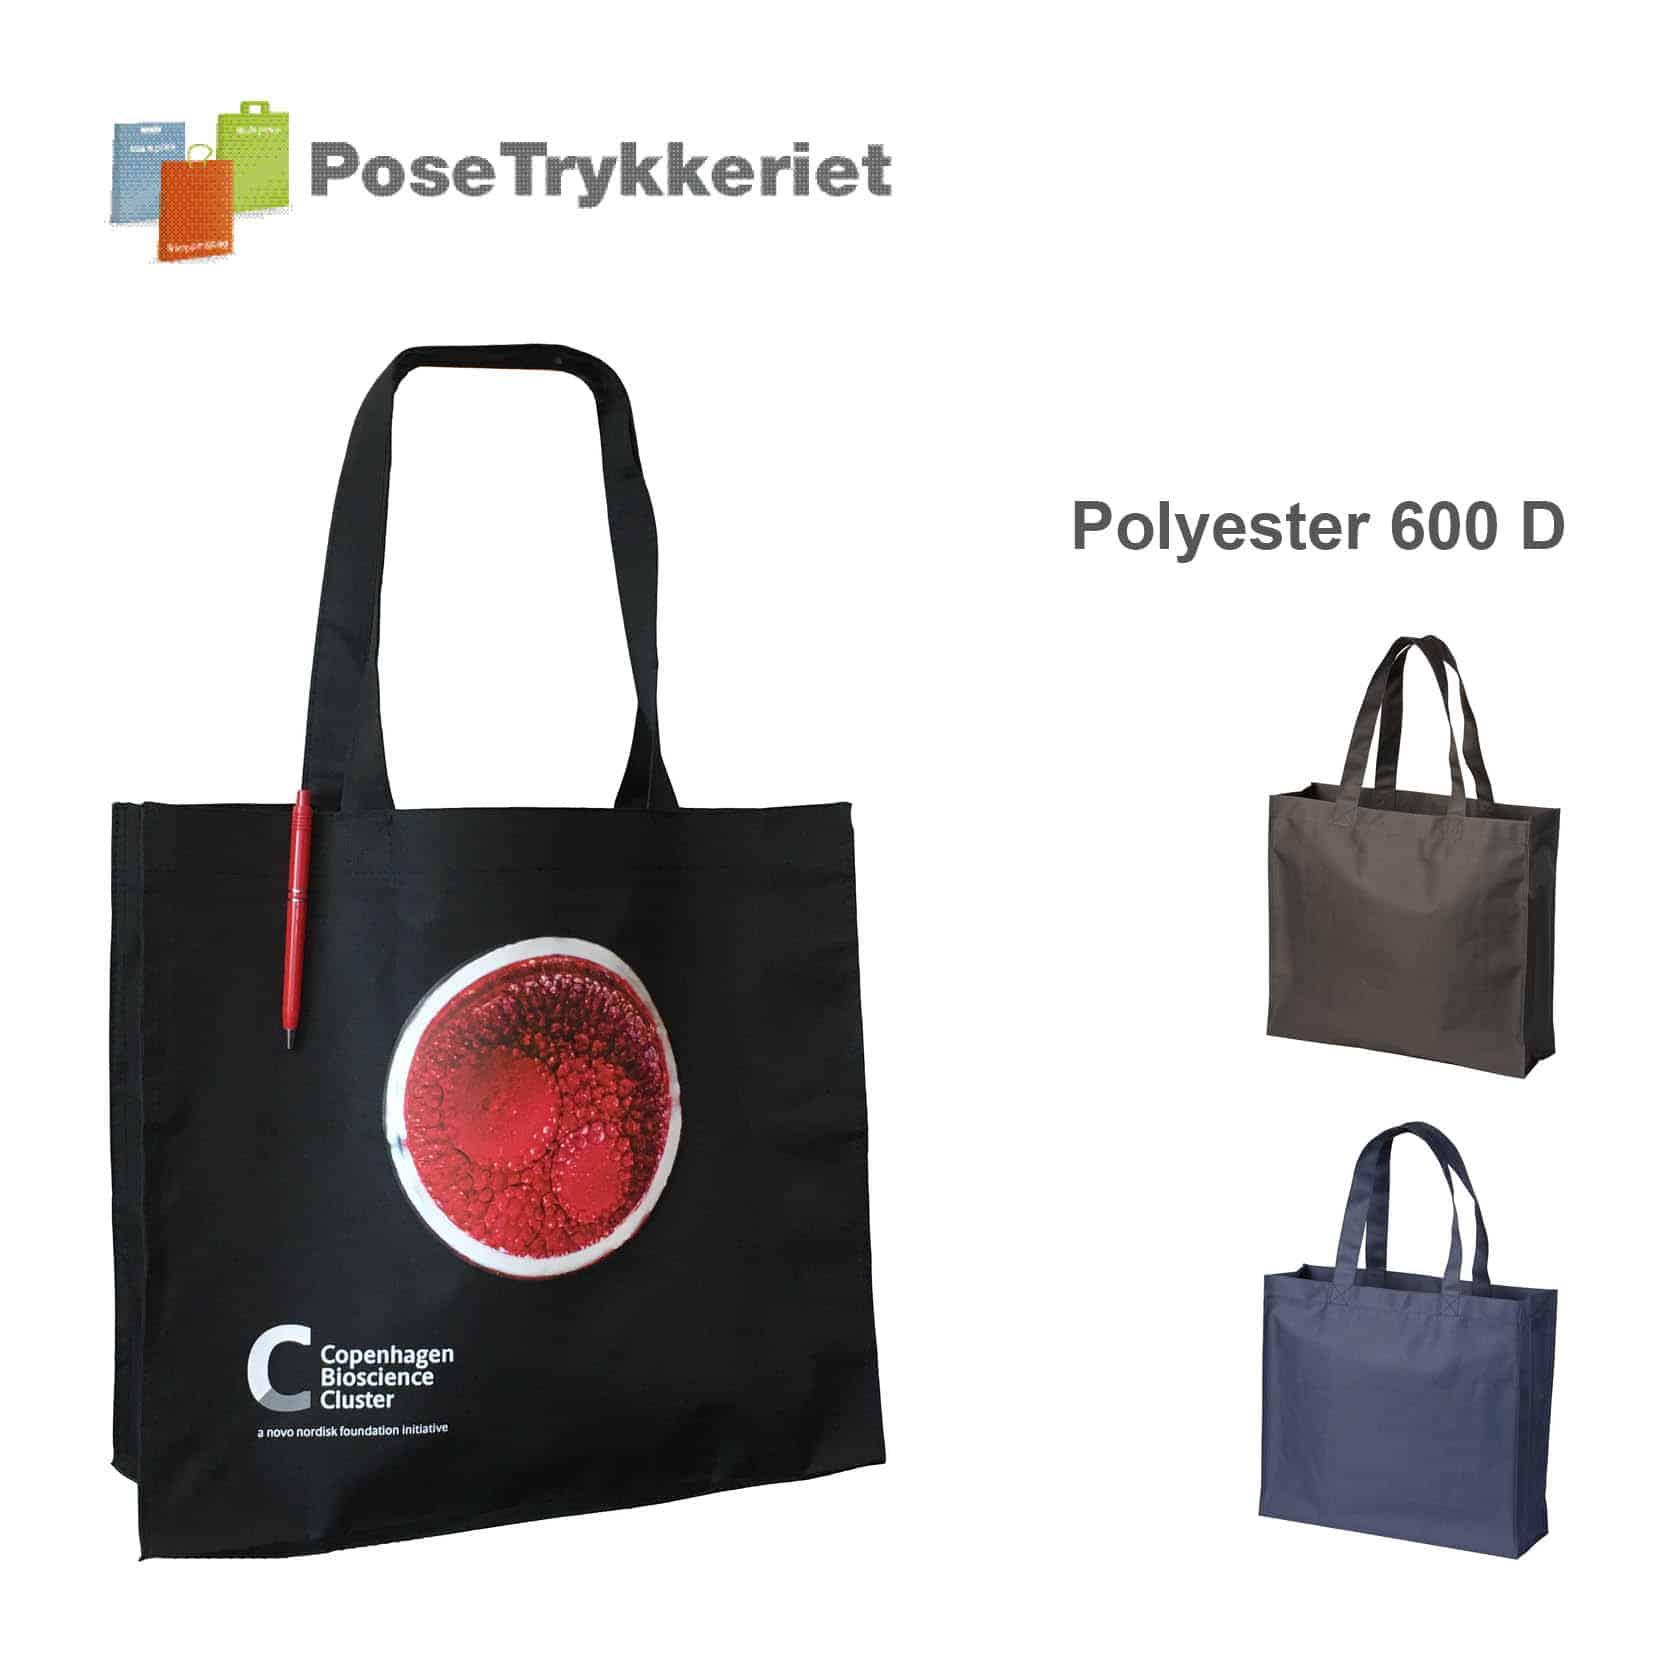 Big shopper, PoseTrykkeriet.dk